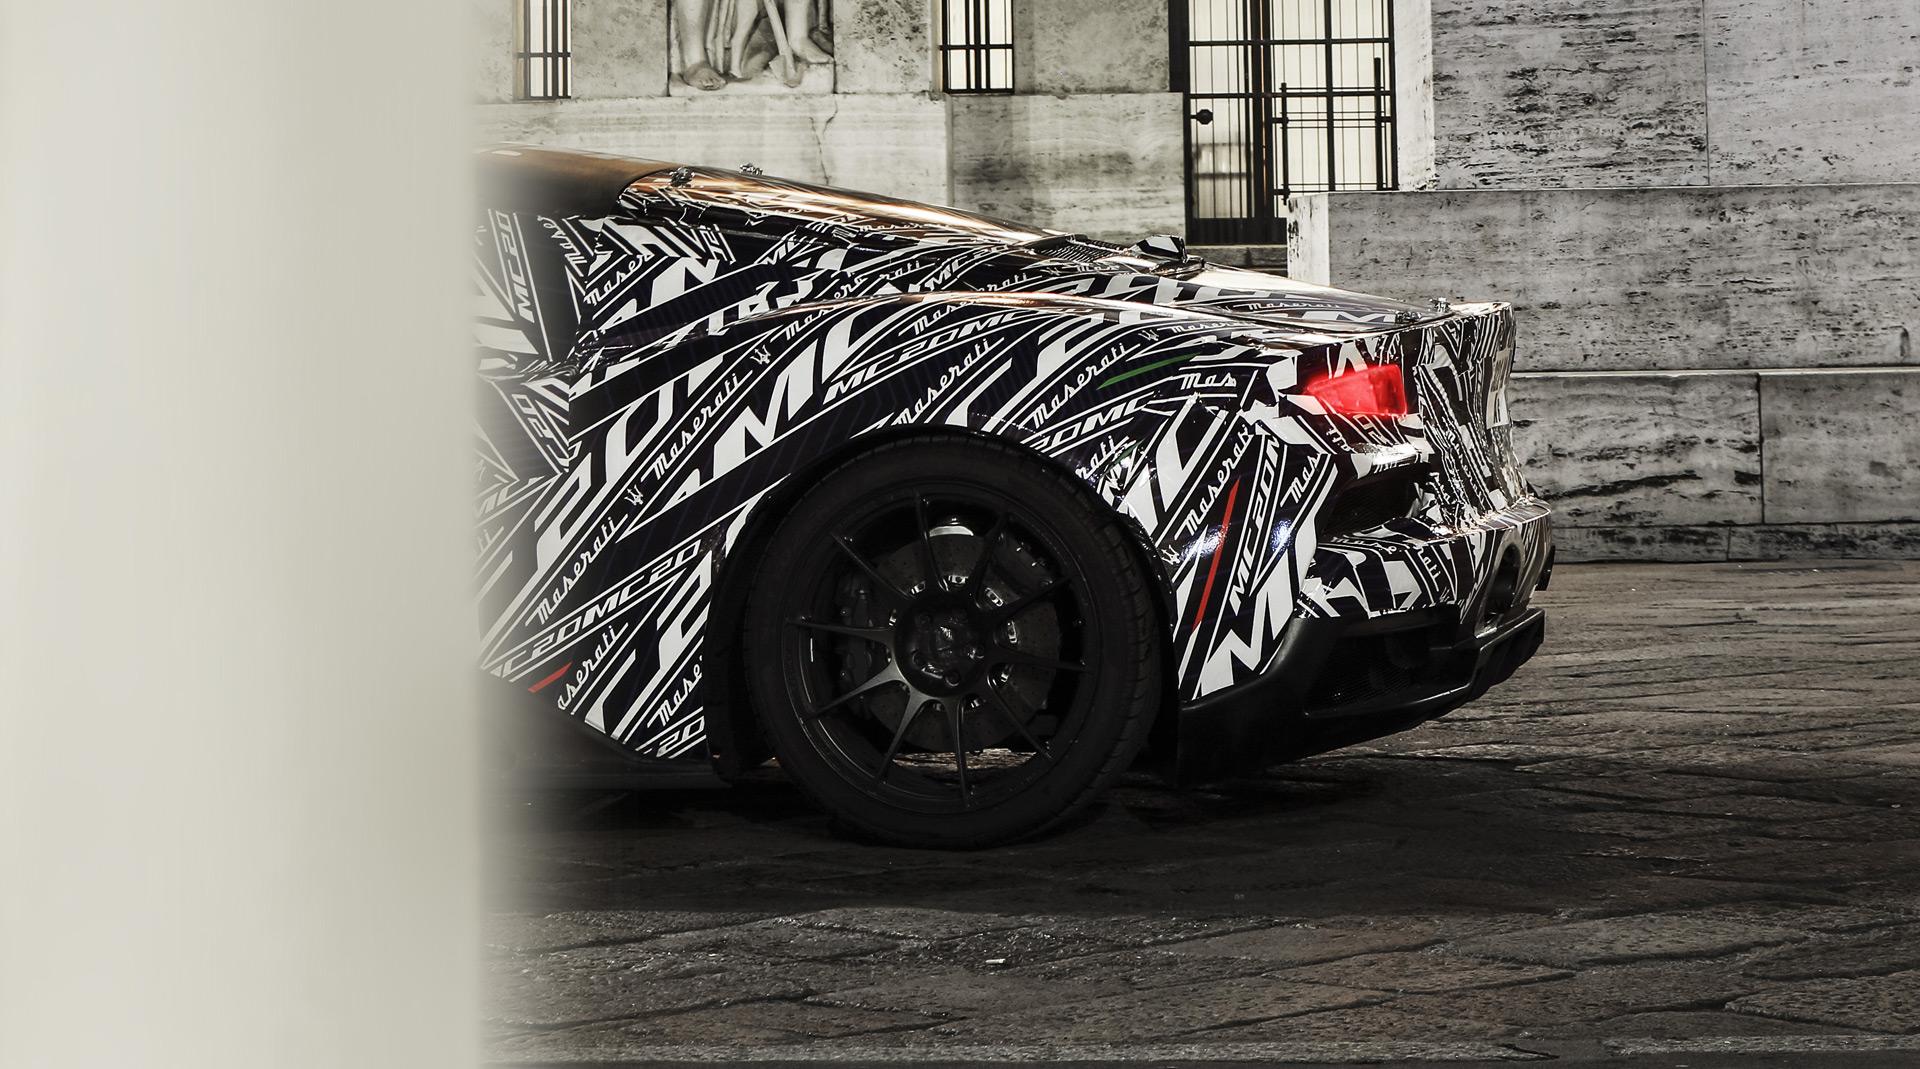 Reveal of Maserati MC20 supercar delayed due to coronavirus